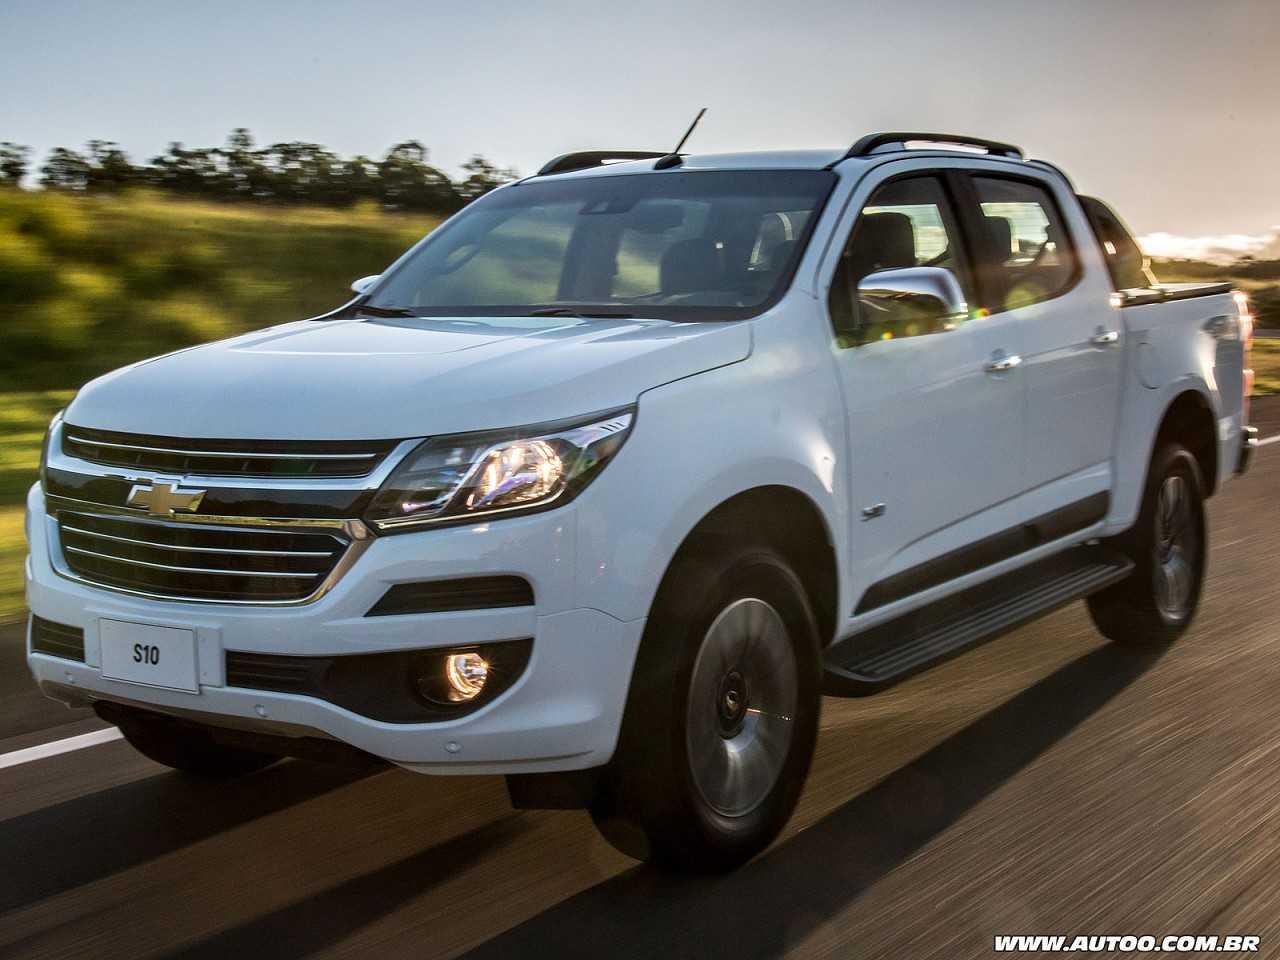 ChevroletS10 2019 - ângulo frontal